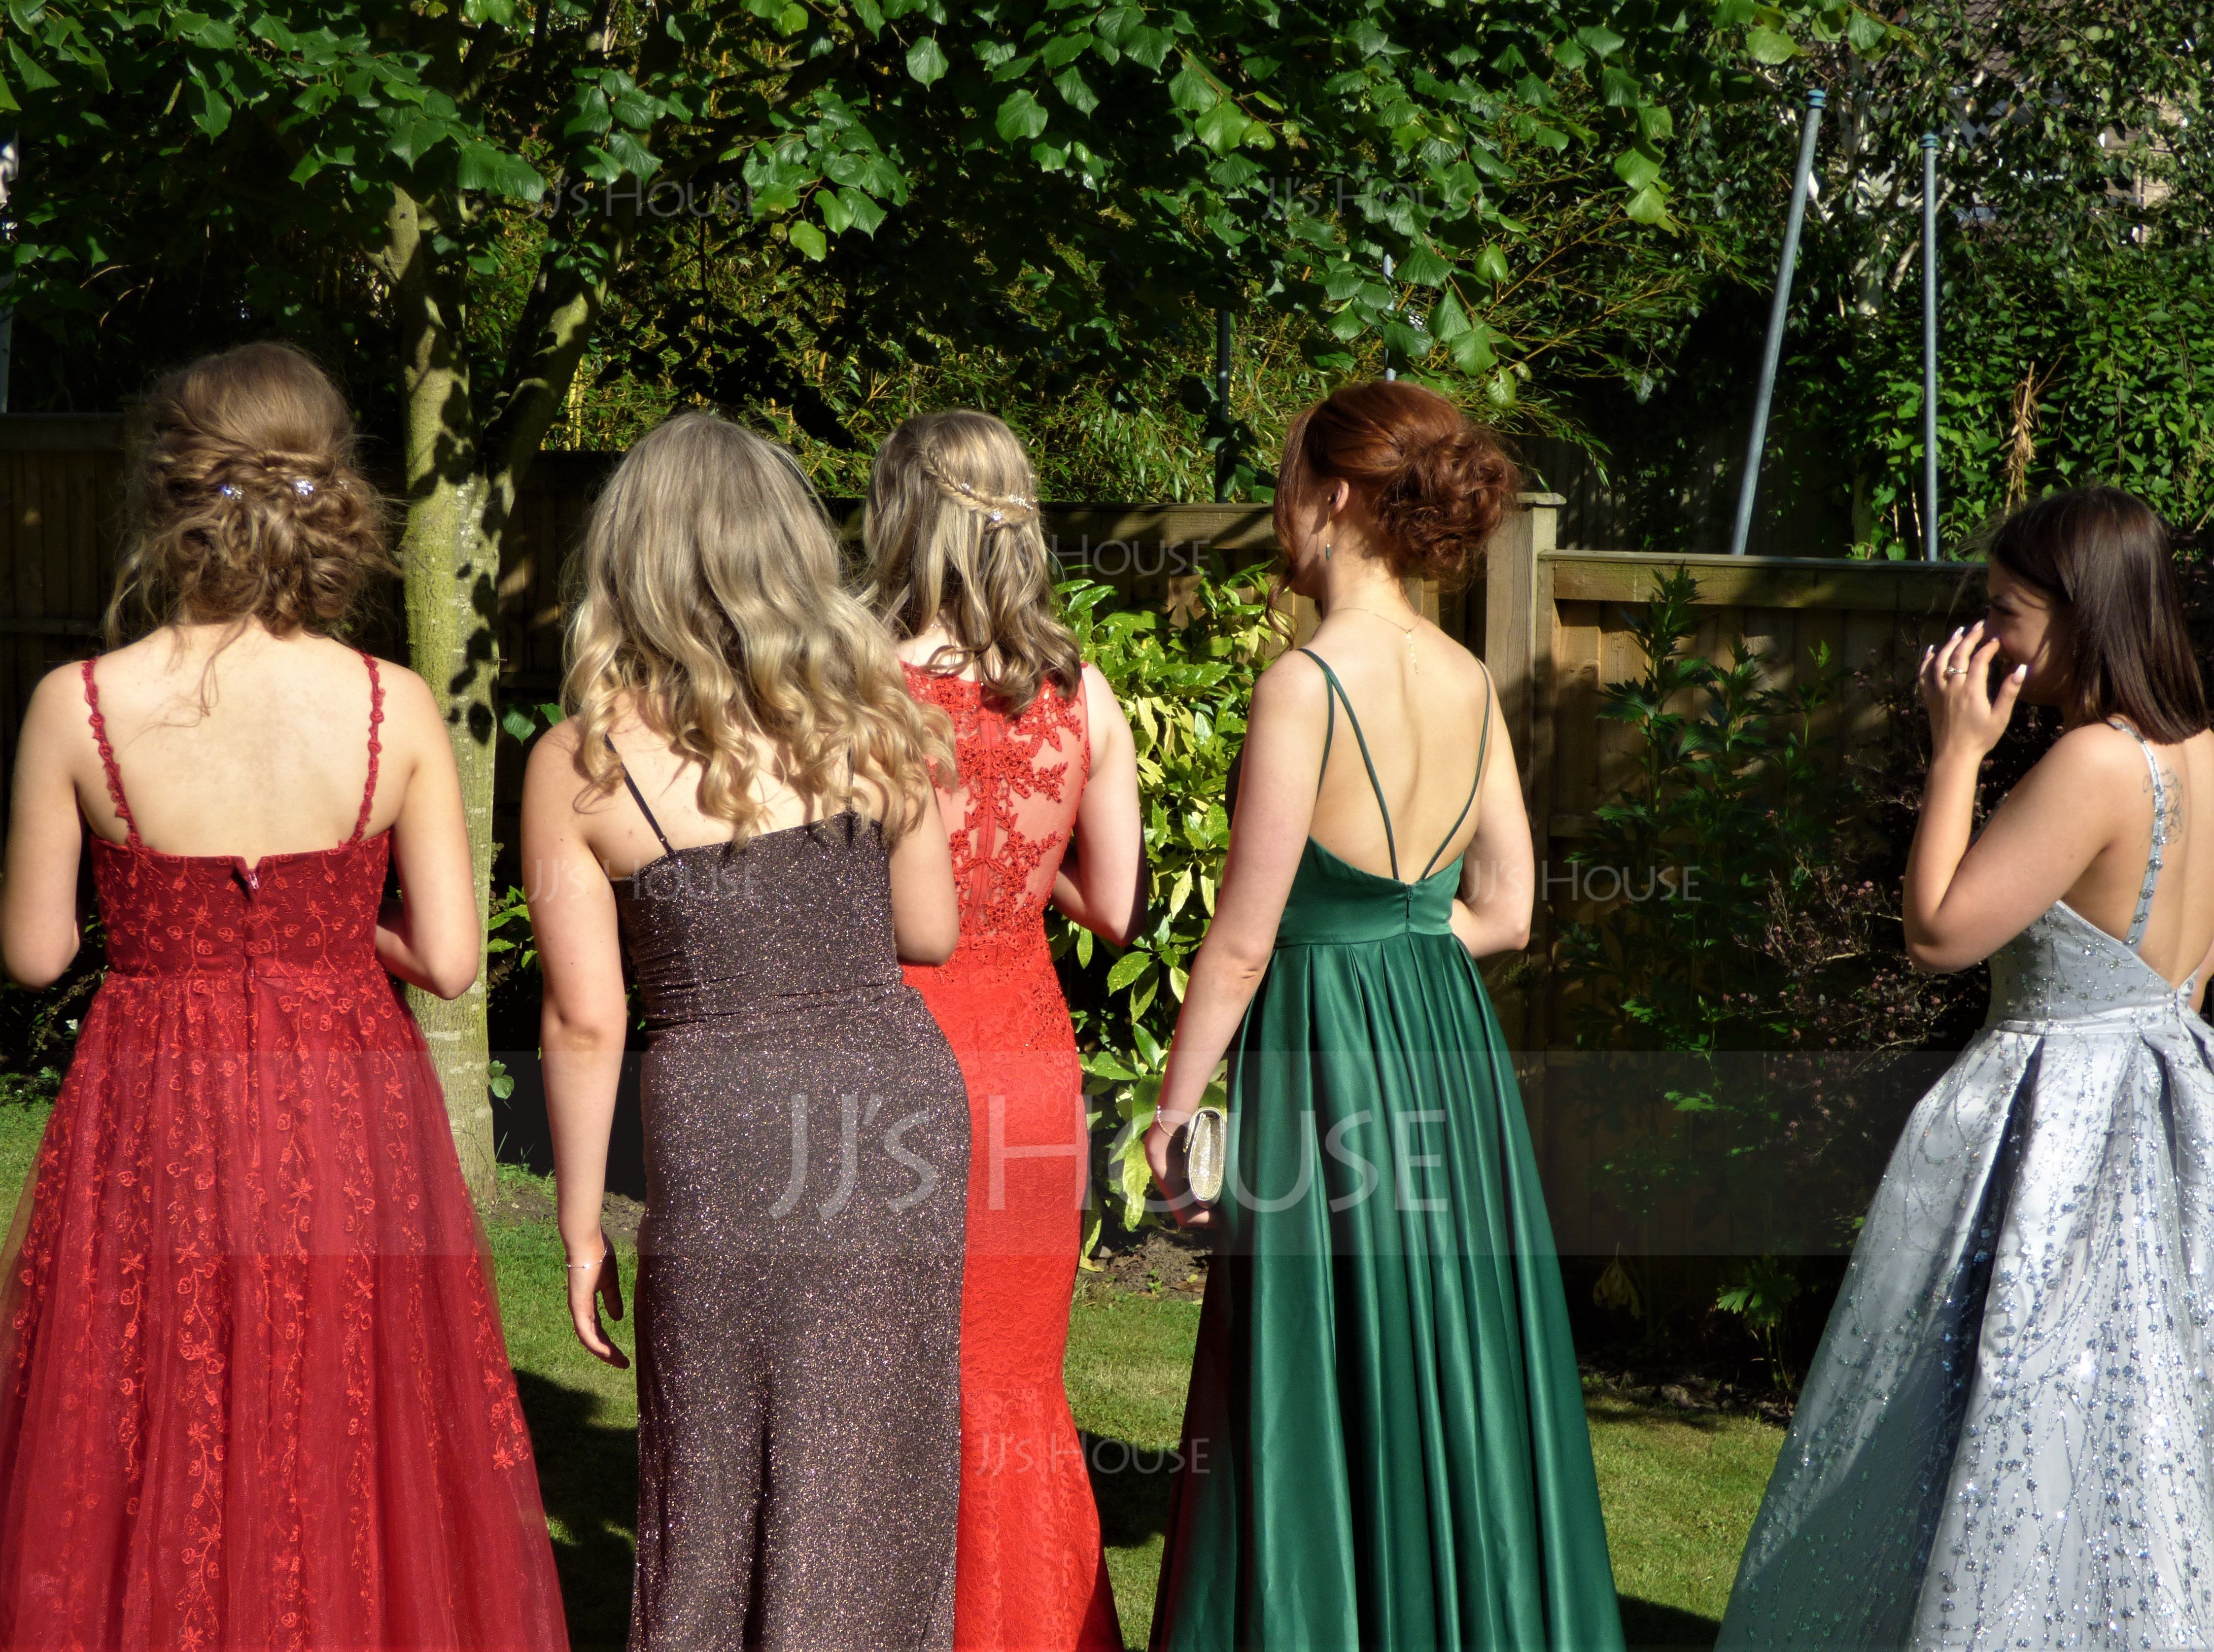 A-Line V-neck Floor-Length Satin Prom Dresses With Ruffle Pockets (018175919)